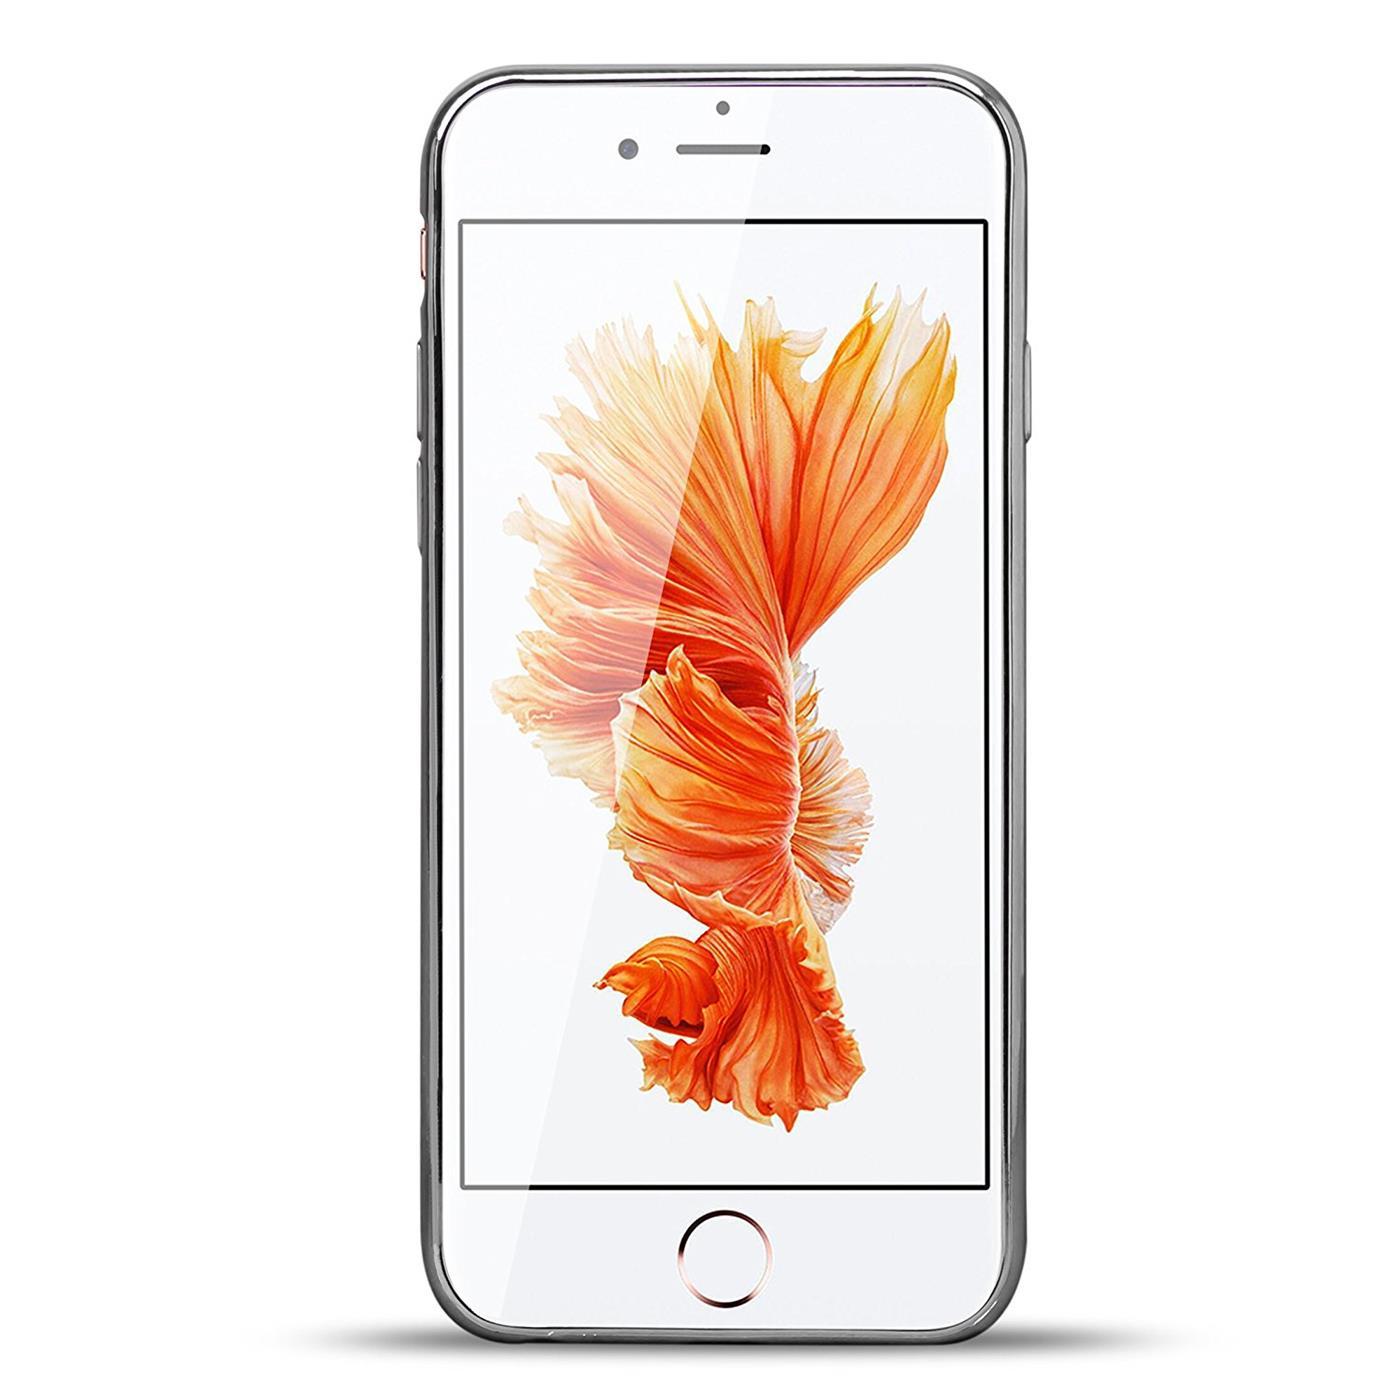 Handy-Etui-Apple-iPhone-6-6S-Plus-Huelle-Glitzer-Silikon-Case-Schutz-Cover-Tasche